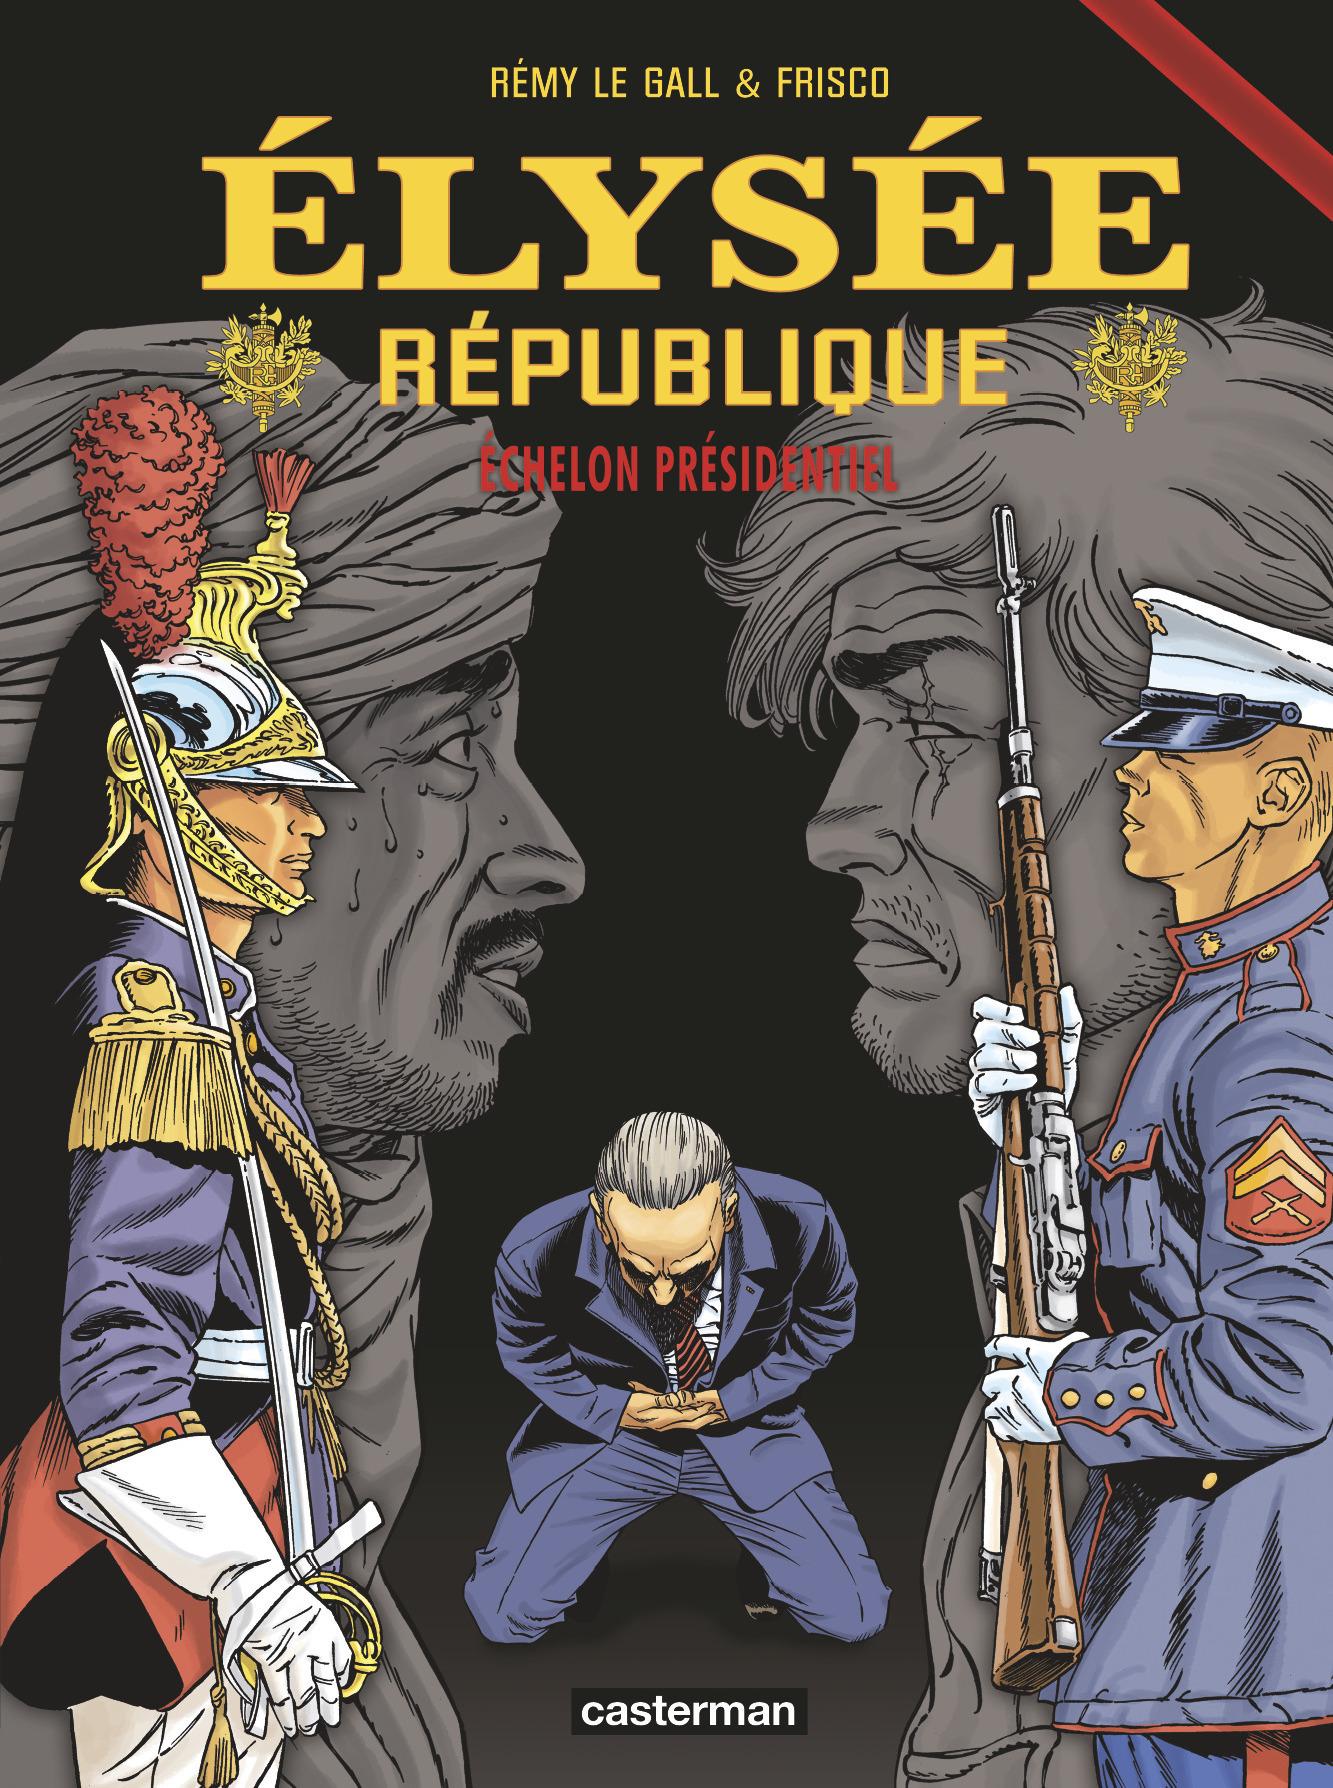 ECHELON PRESIDENTIEL - ELYSEE REPUBLIQUE - T3